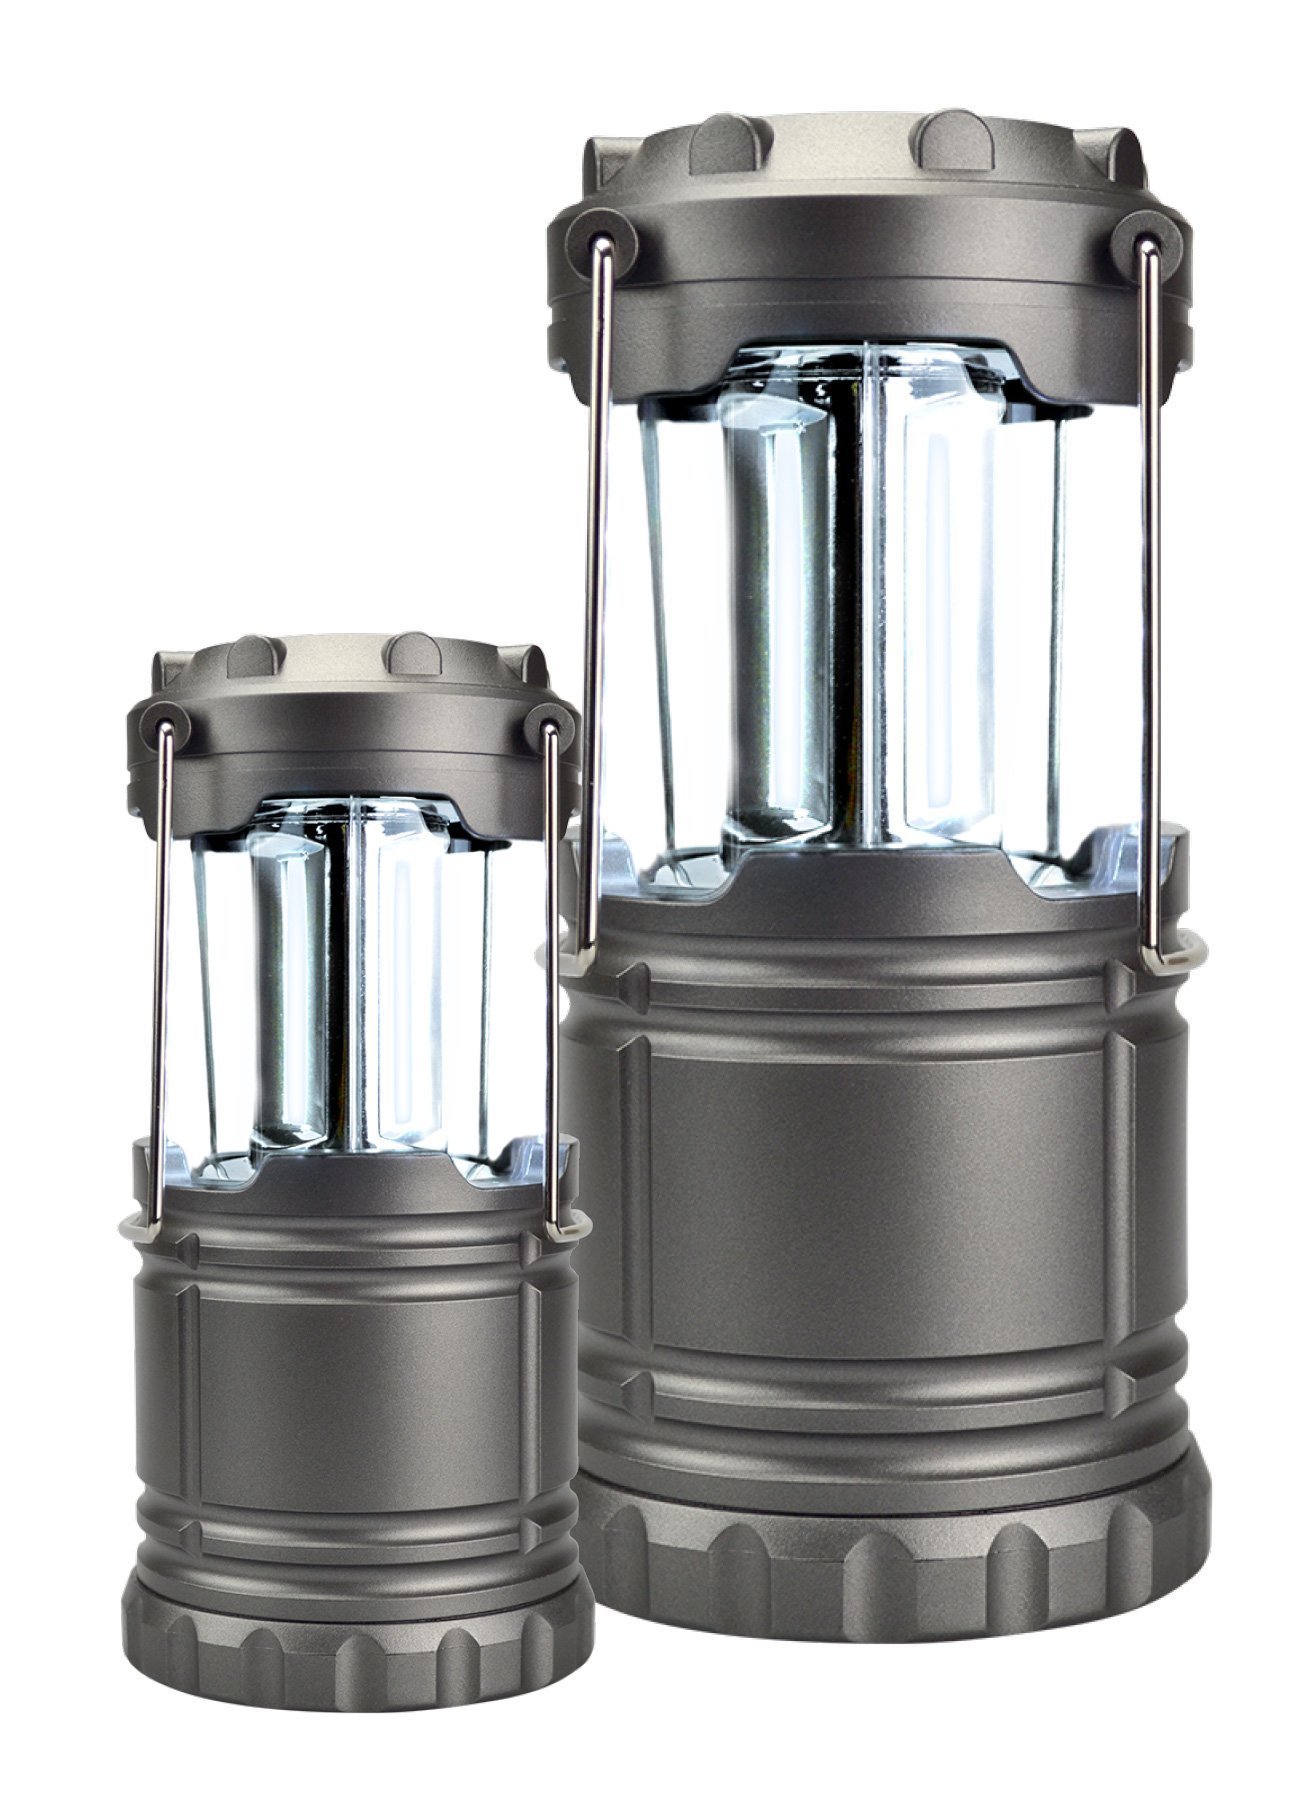 Tac Light Lantern Mini 600 Lumens Bright Beam Camp Atomic